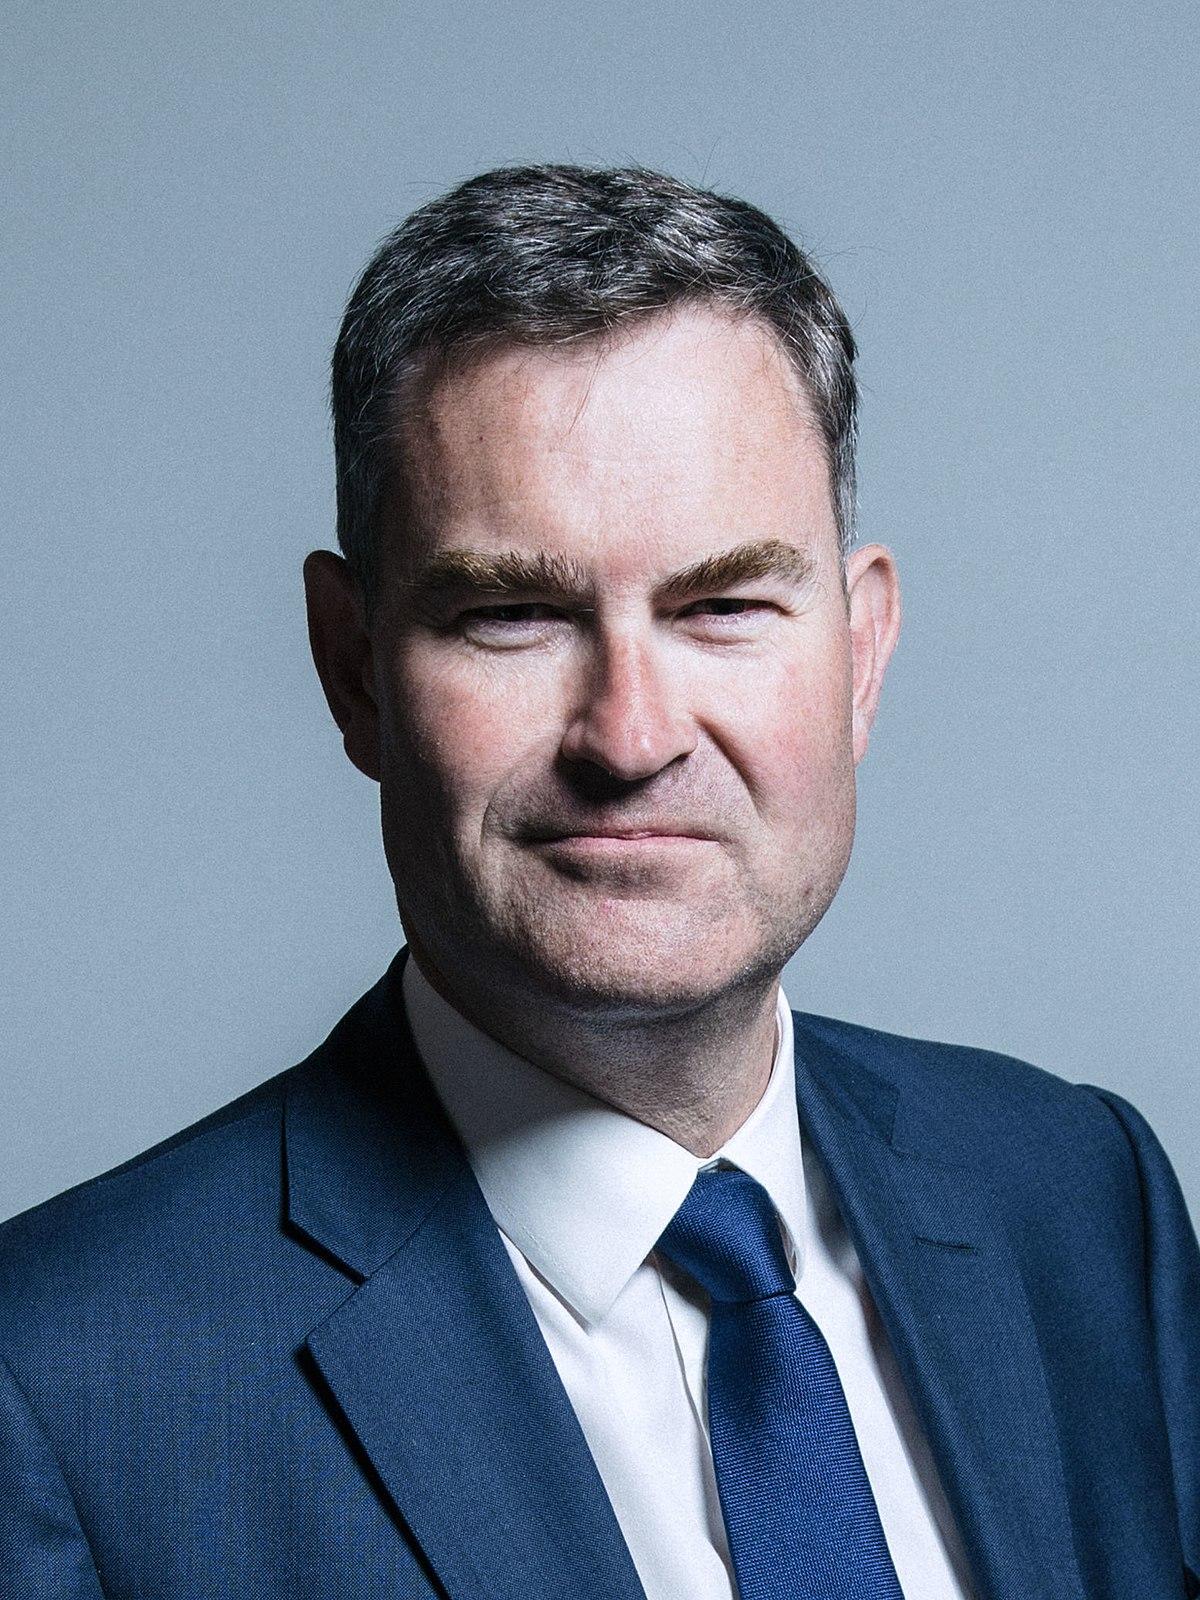 David Gauke - UK Parliament official portraits 2017